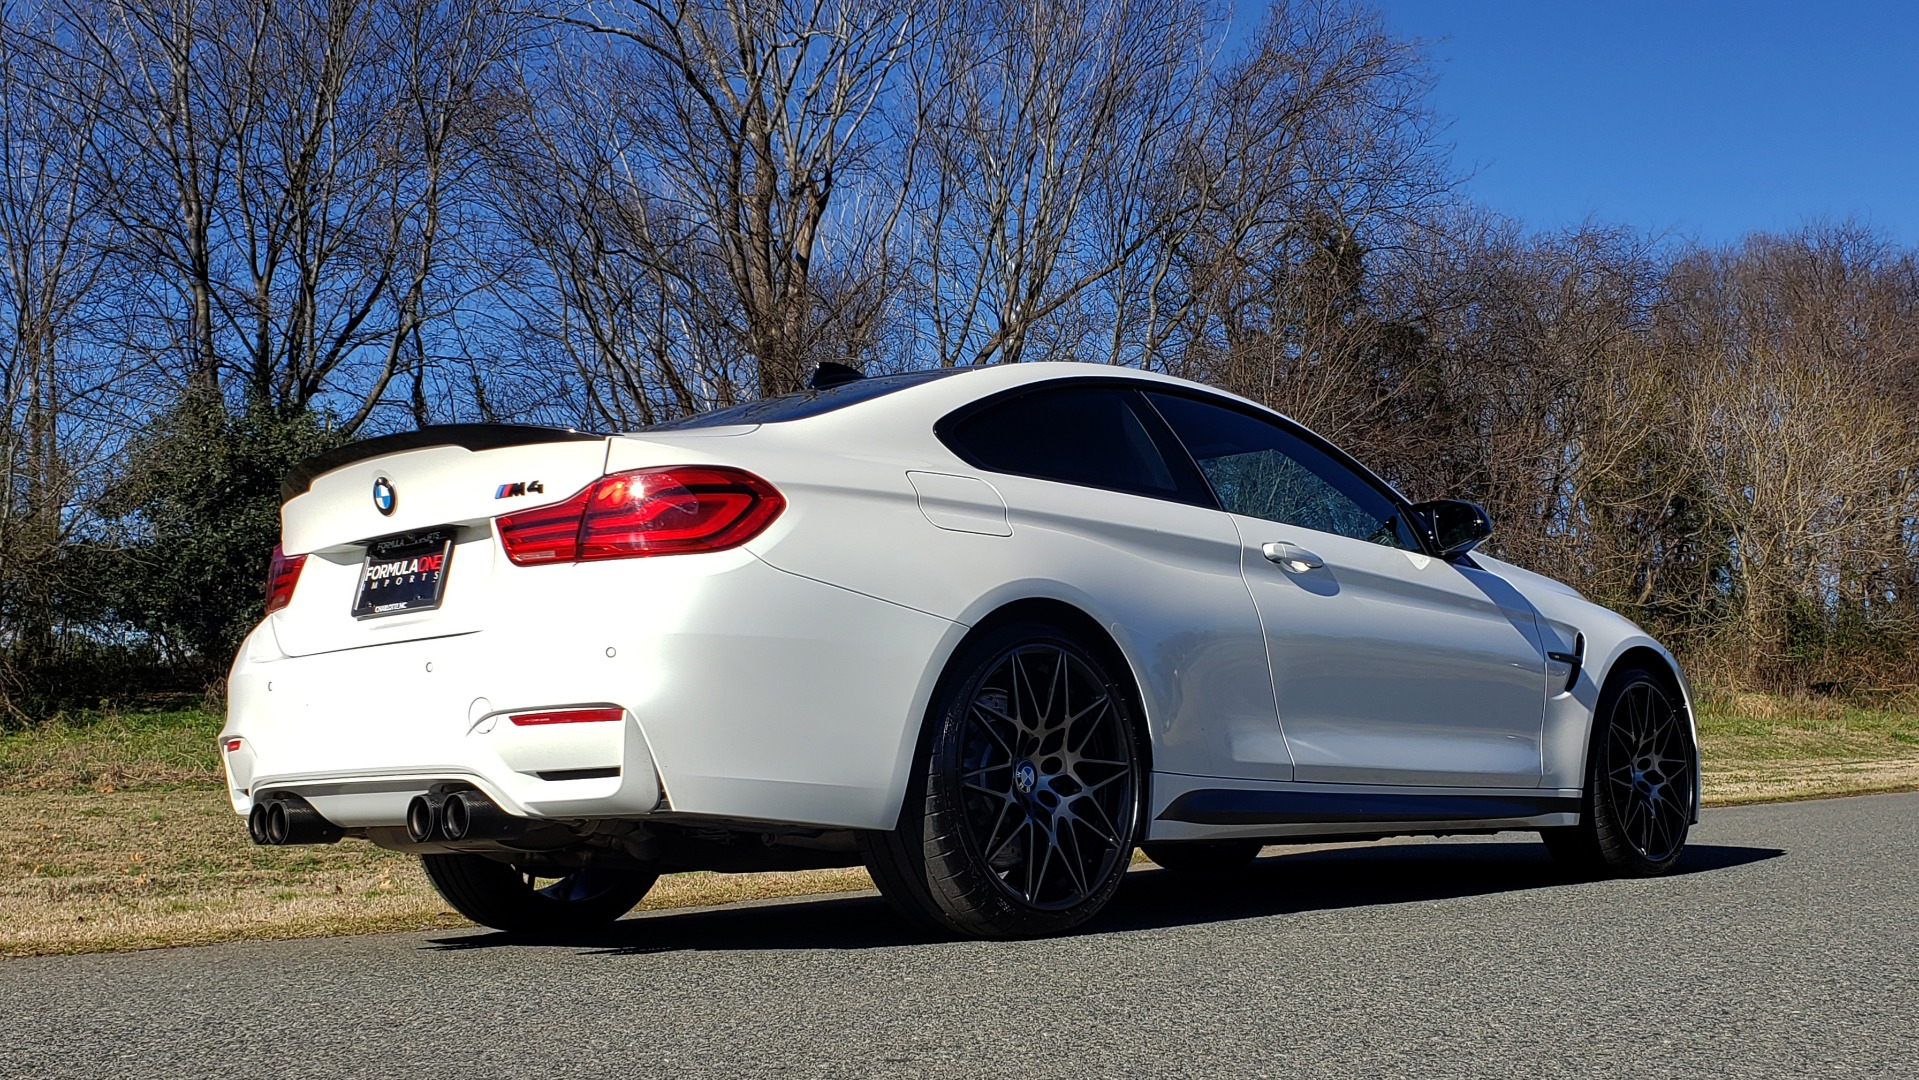 Used 2018 BMW M4 COMP PKG / EXEC / M-DRIVER / PARK CNTRL / ACTIVE BLIND SPOT for sale $45,449 at Formula Imports in Charlotte NC 28227 8